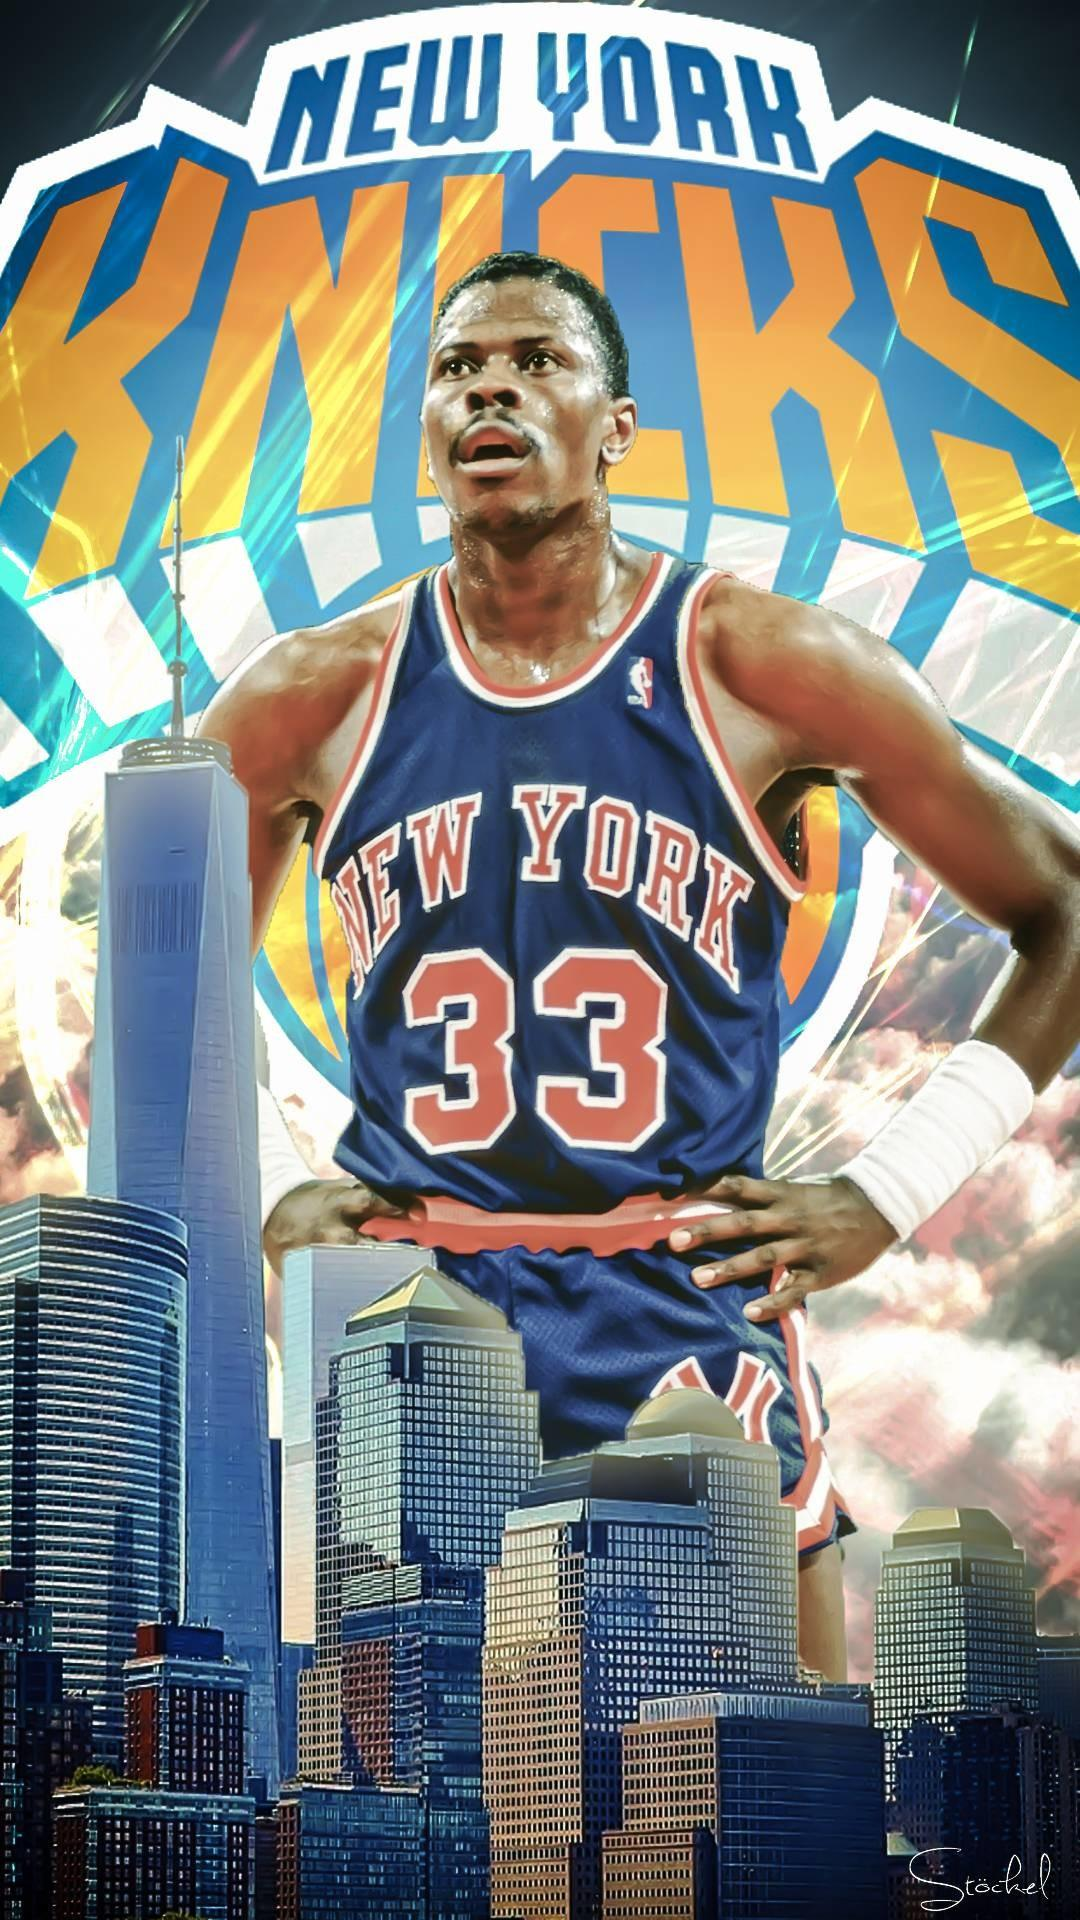 Patrick Ewing Wallpapers - Wallpaper Cave |Patrick Ewing Wallpaper